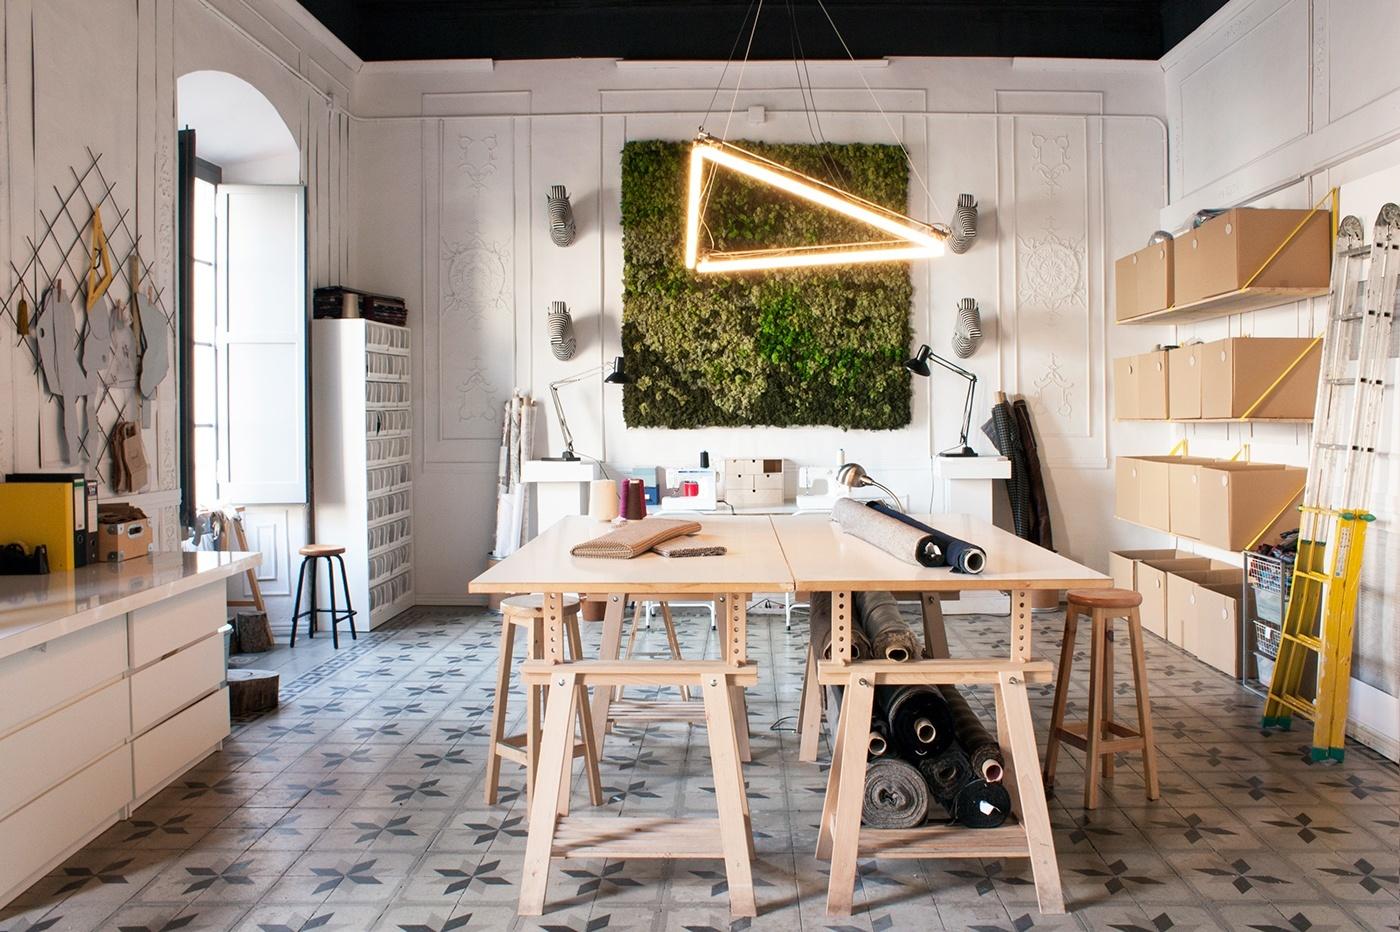 A peek inside softheads trendy office in barcelona for Studio interior design brescia